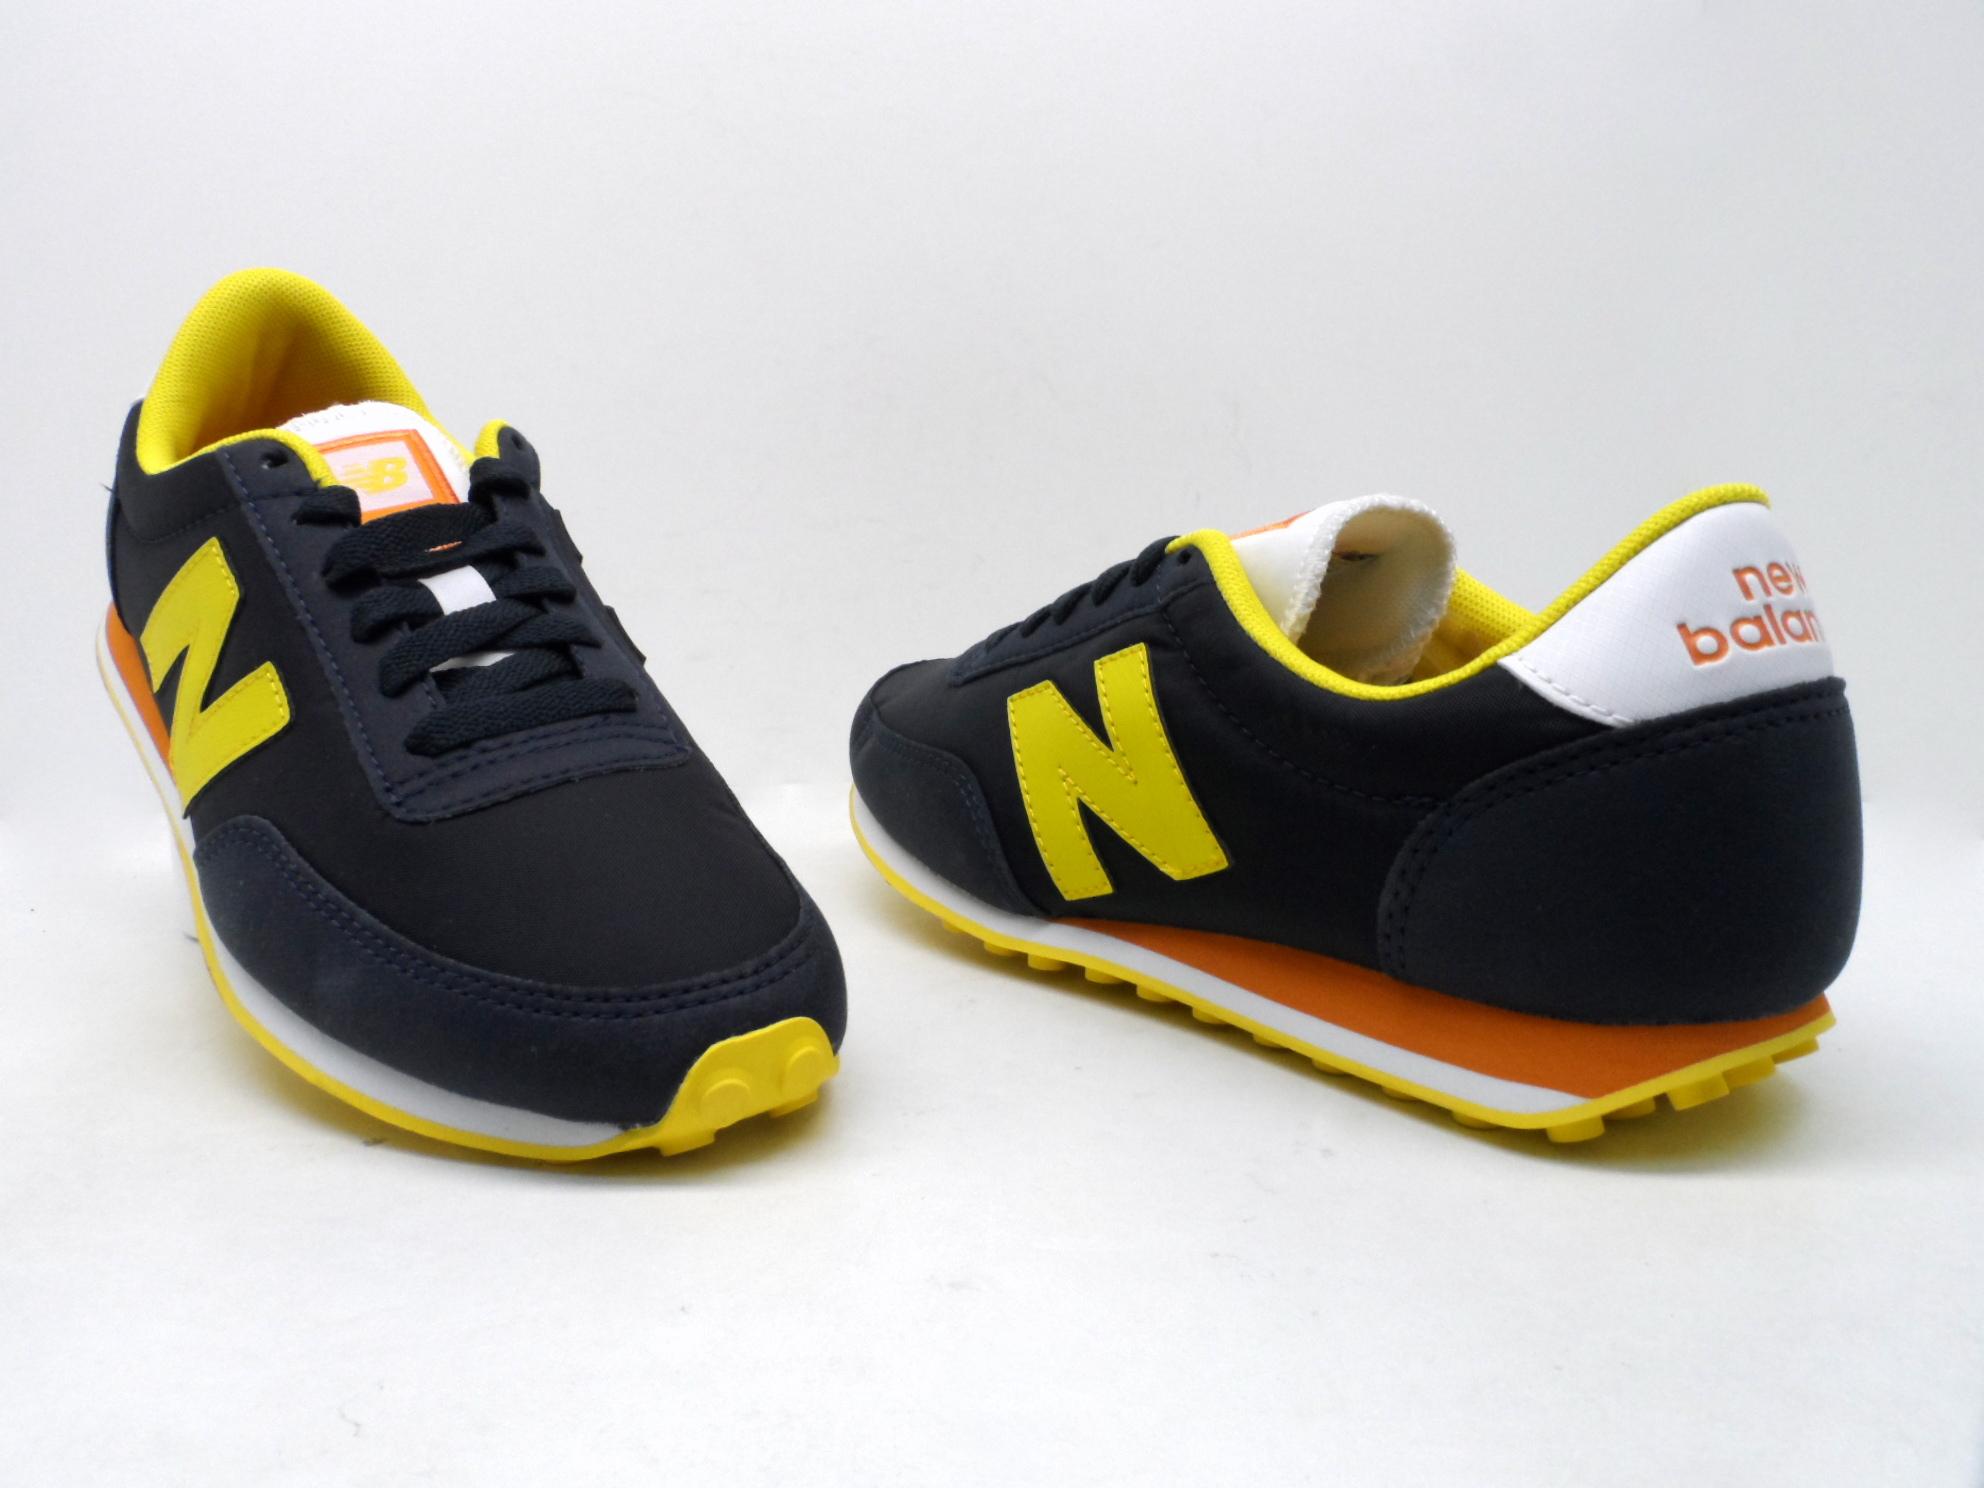 new balance 574 navy yellow box